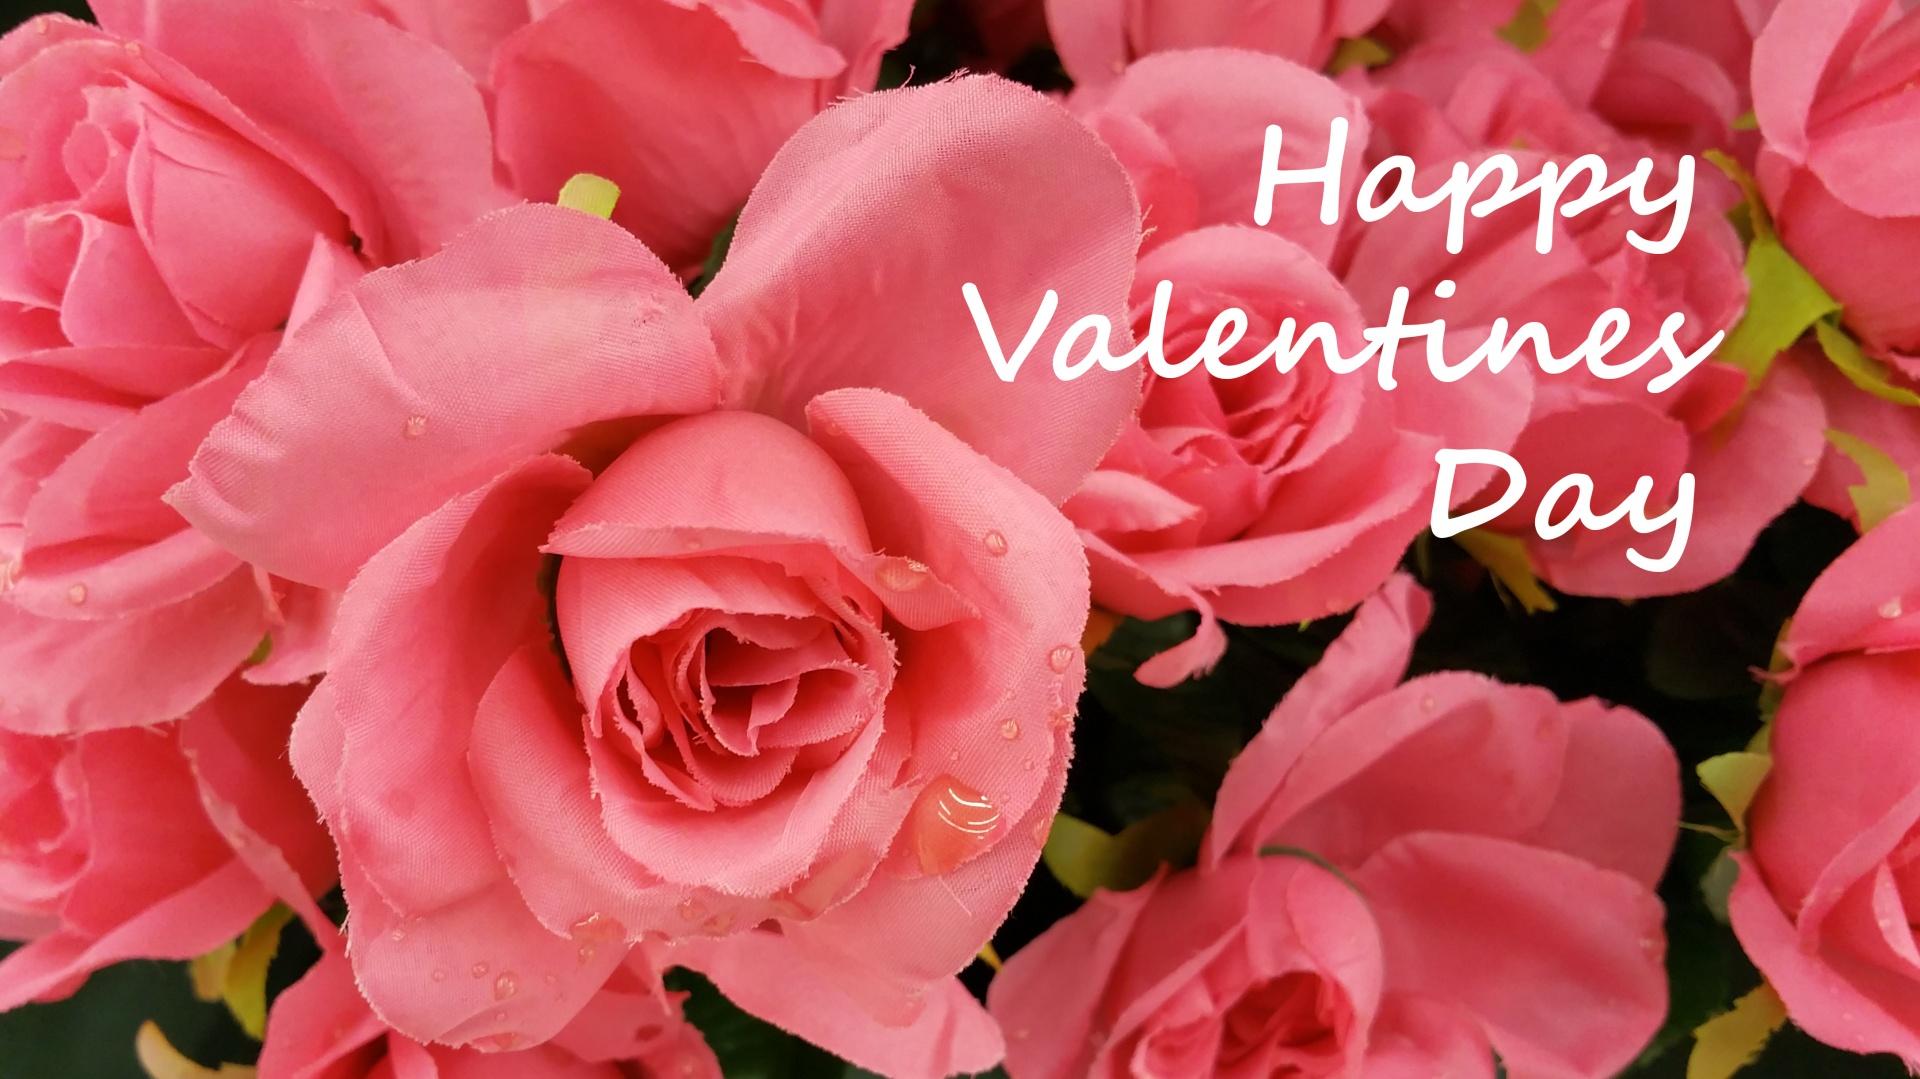 Romance, Happy Valentine's Day, Be my Valentine